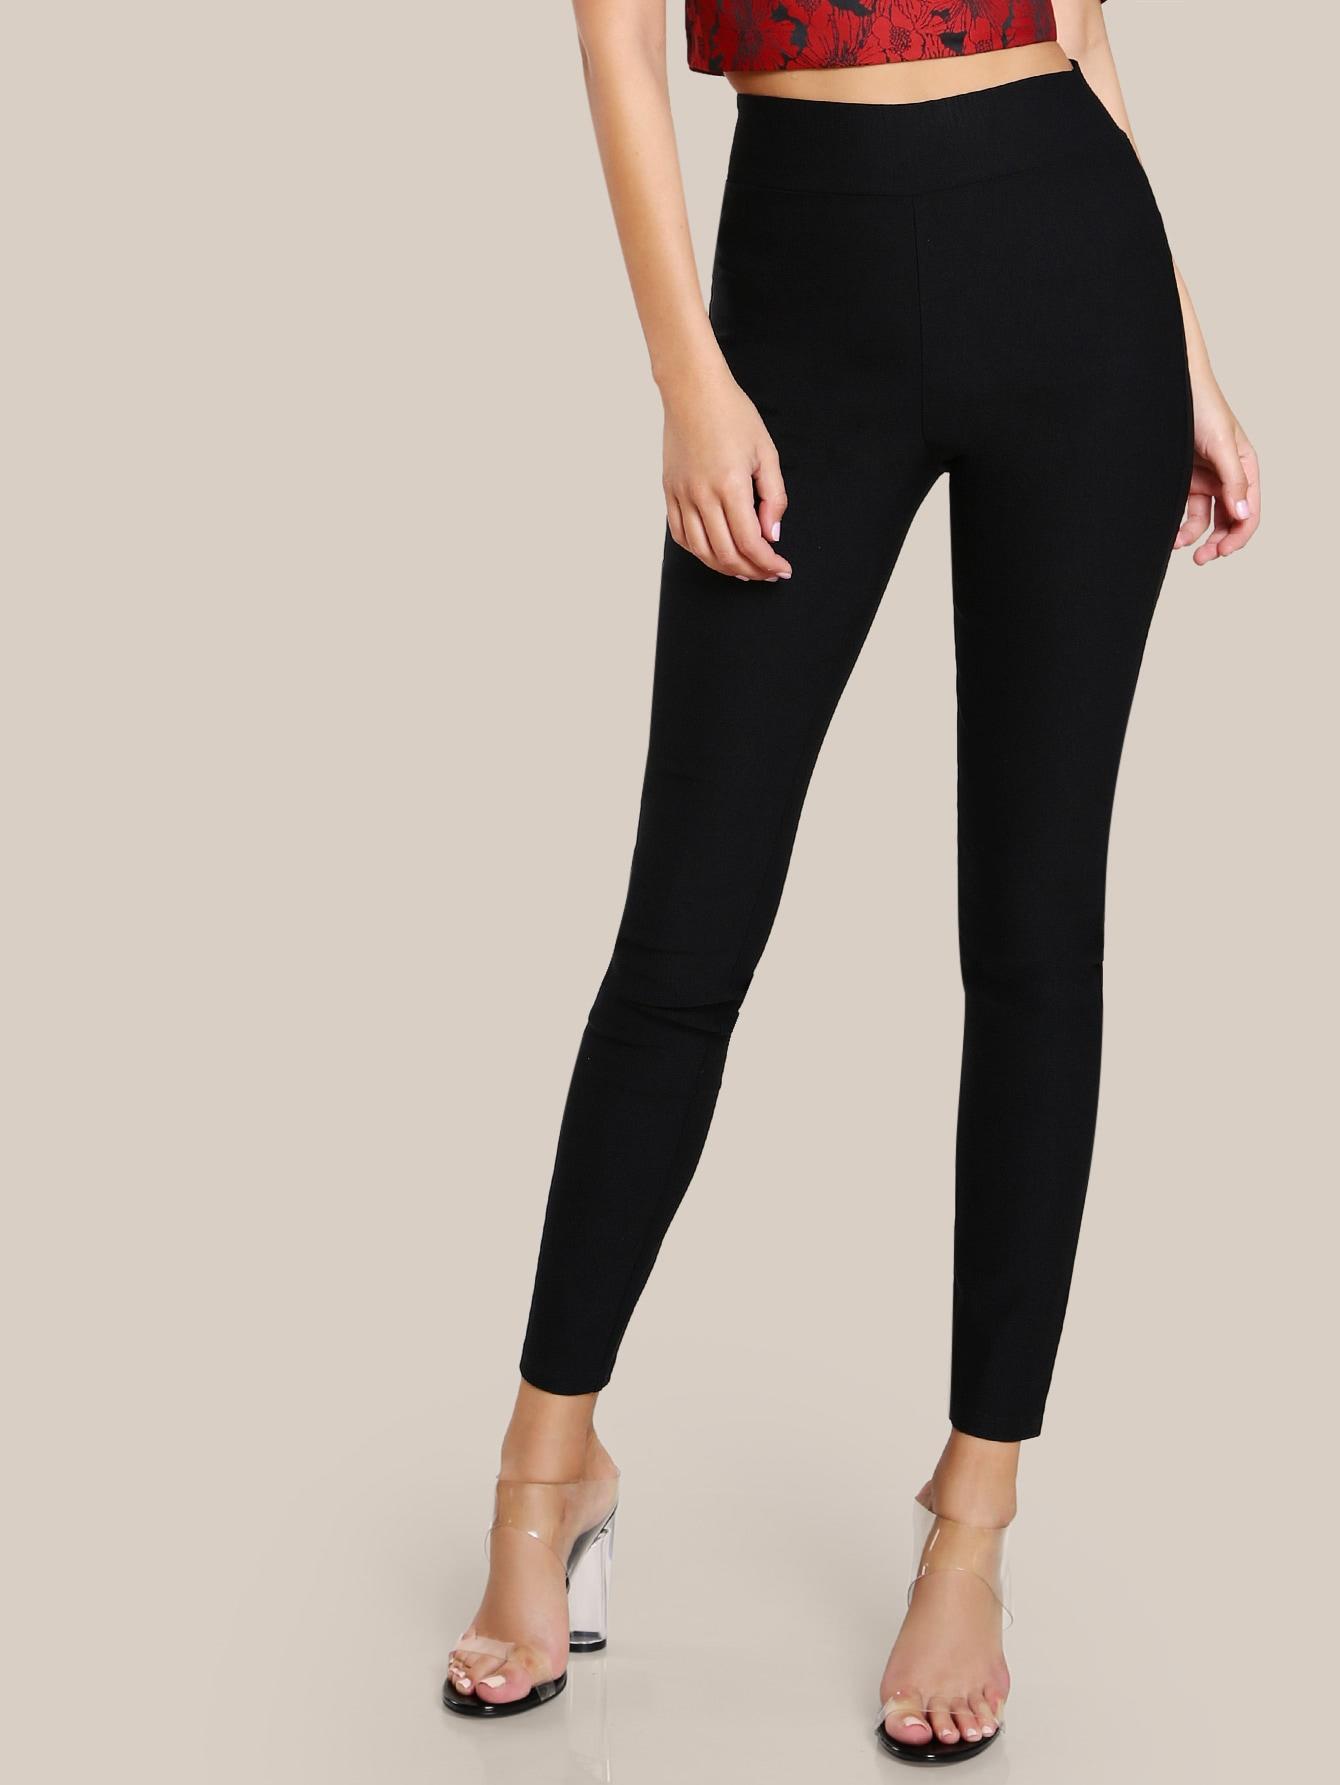 Elasticized Waist Skinny Pants elasticized waist velvet pants